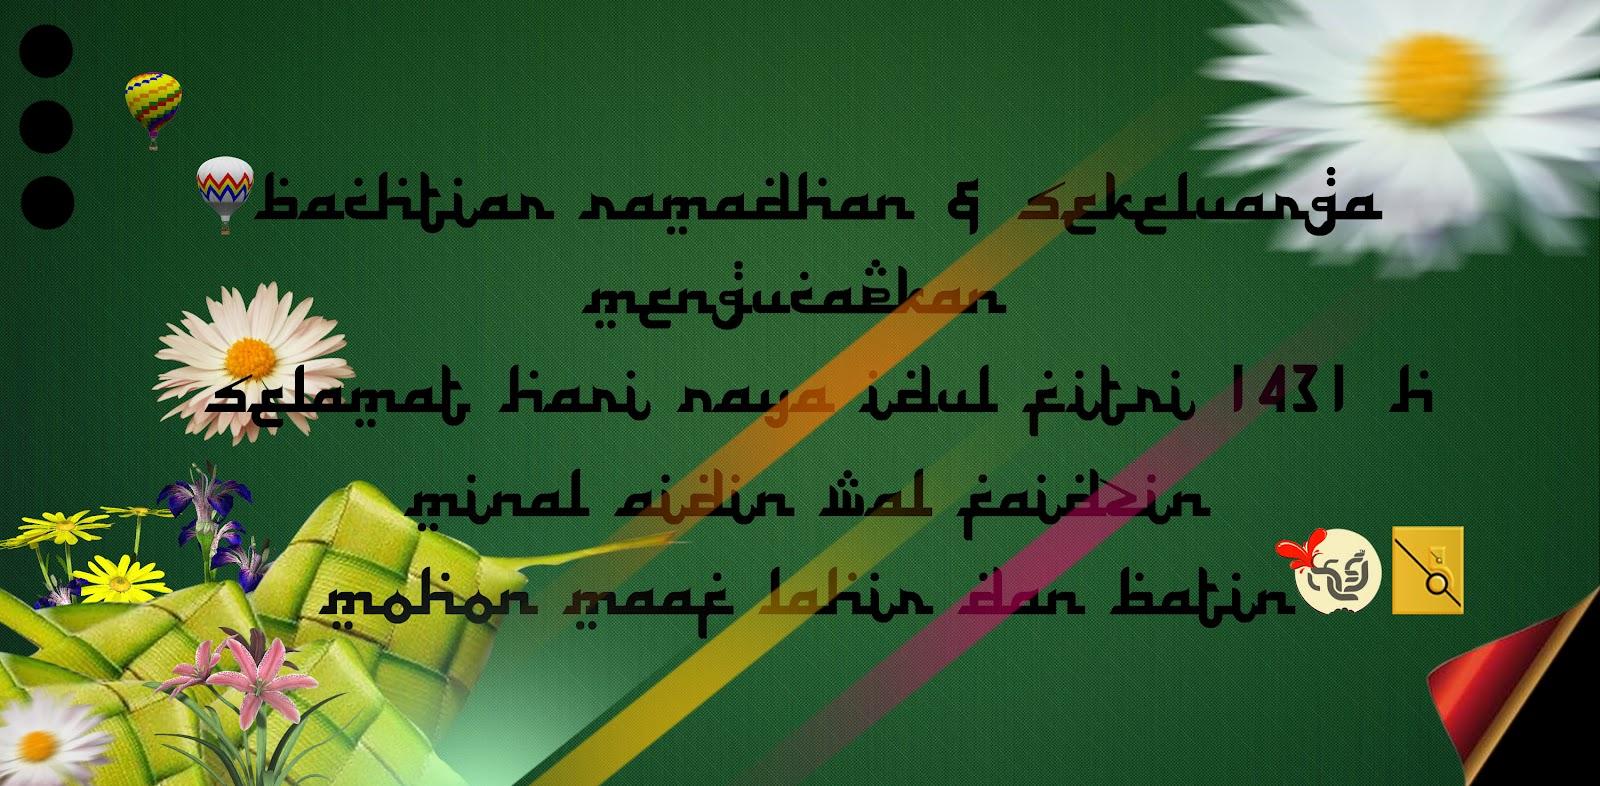 http://1.bp.blogspot.com/-mgQ575oZD-Q/UBJ6kB8qb2I/AAAAAAAAAP8/tXATIuAfeY8/s1600/Wallpaper+Indah+Syawal+-+Idul+Fitri+-+Syawal+2012+%287%29.jpg